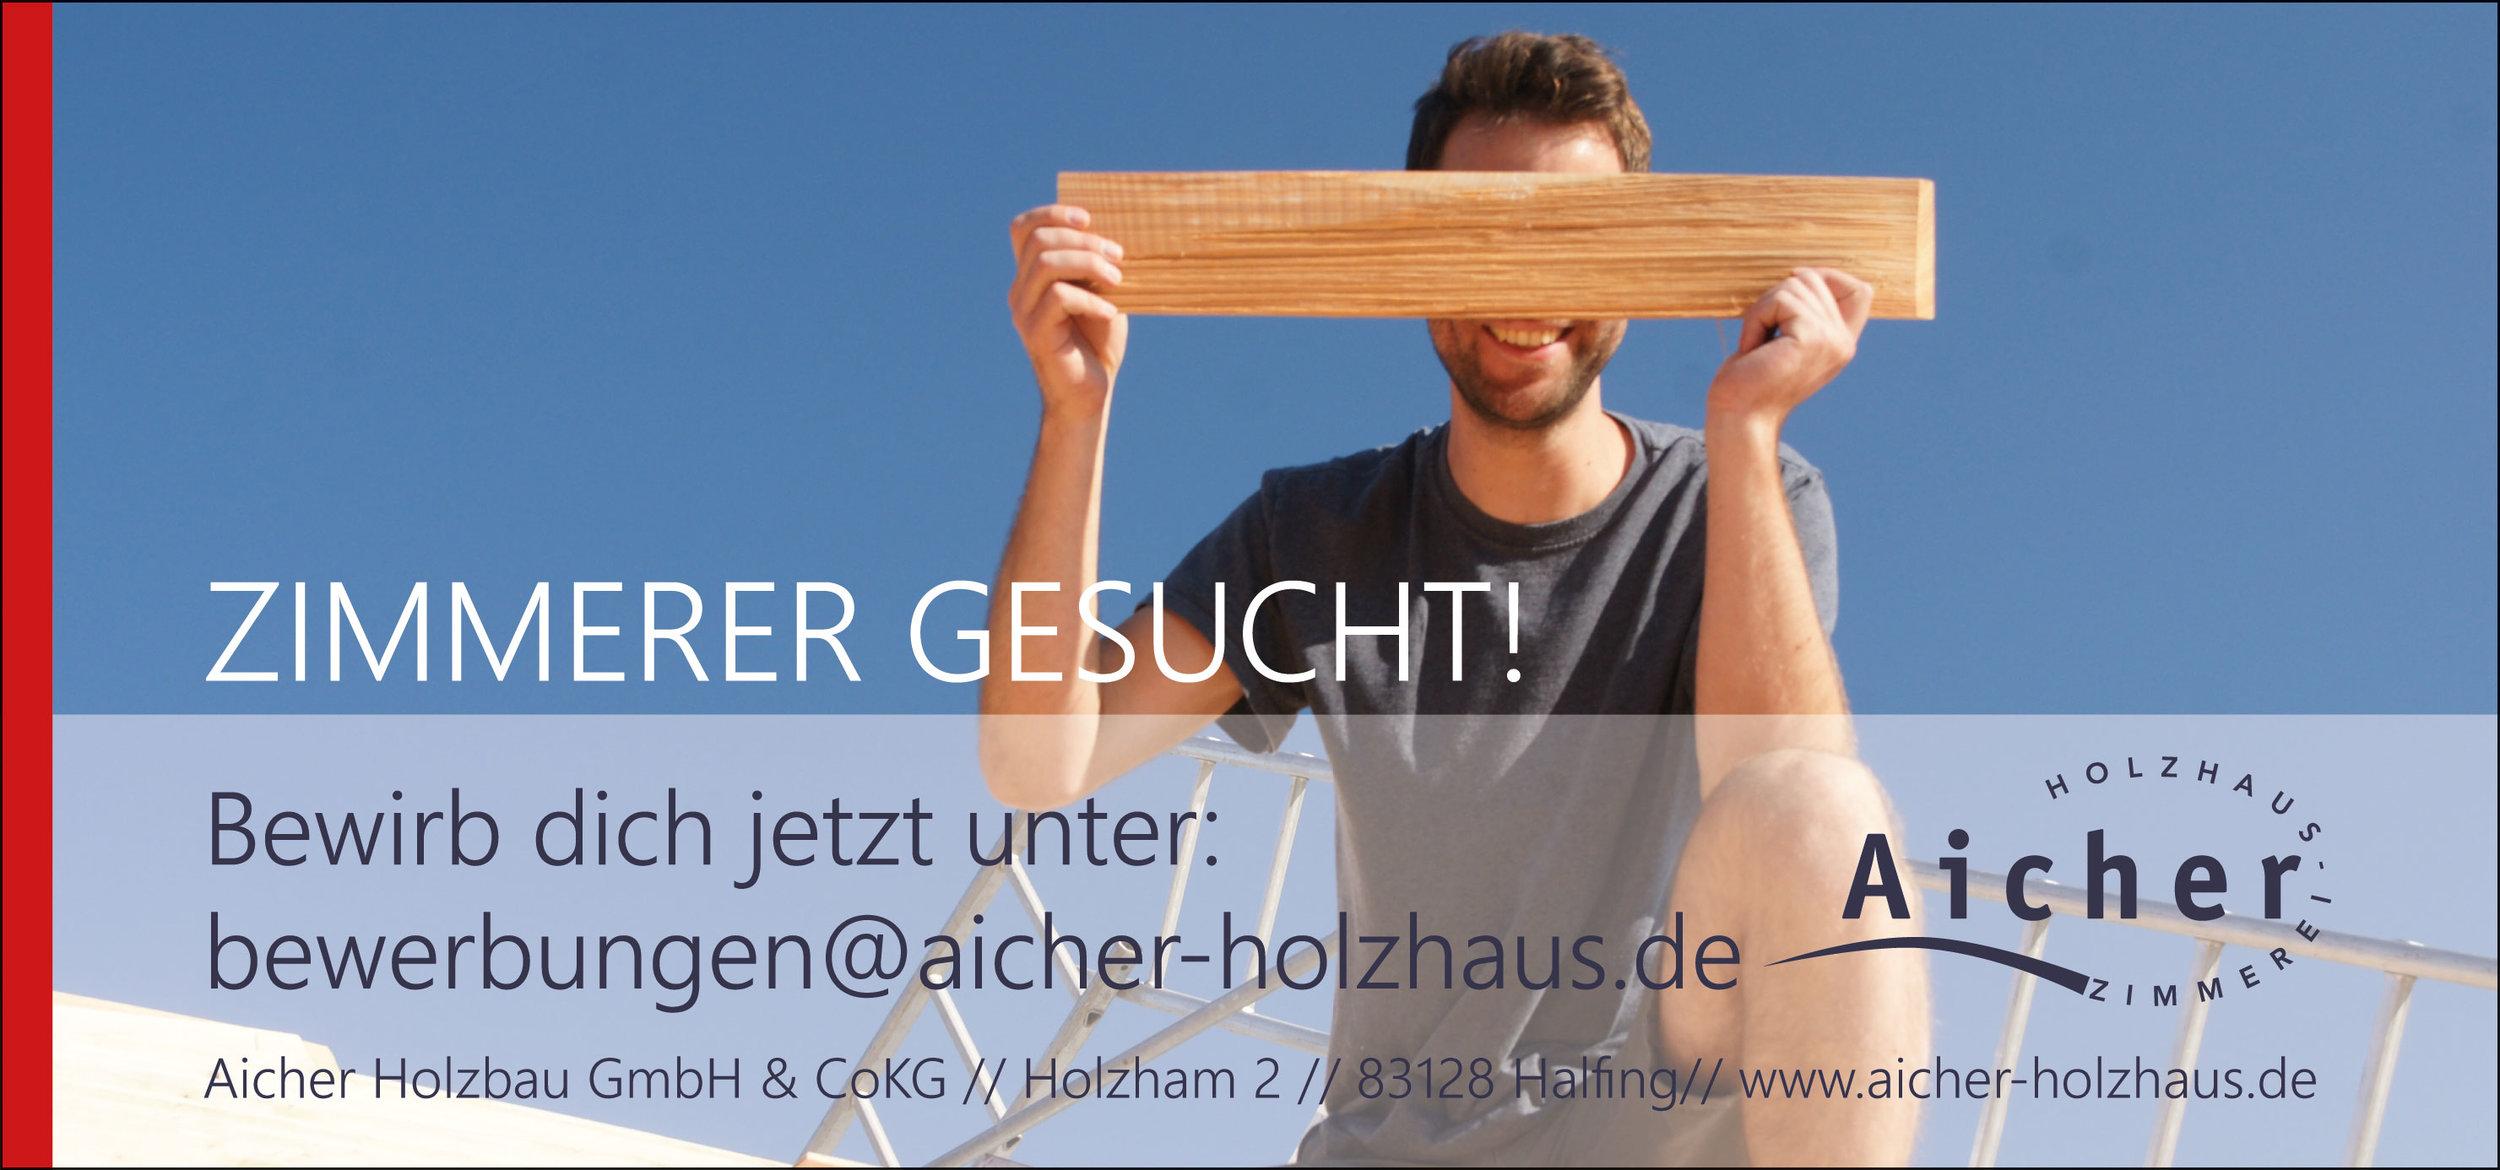 Facebook_Zimmerer-gesucht.jpg